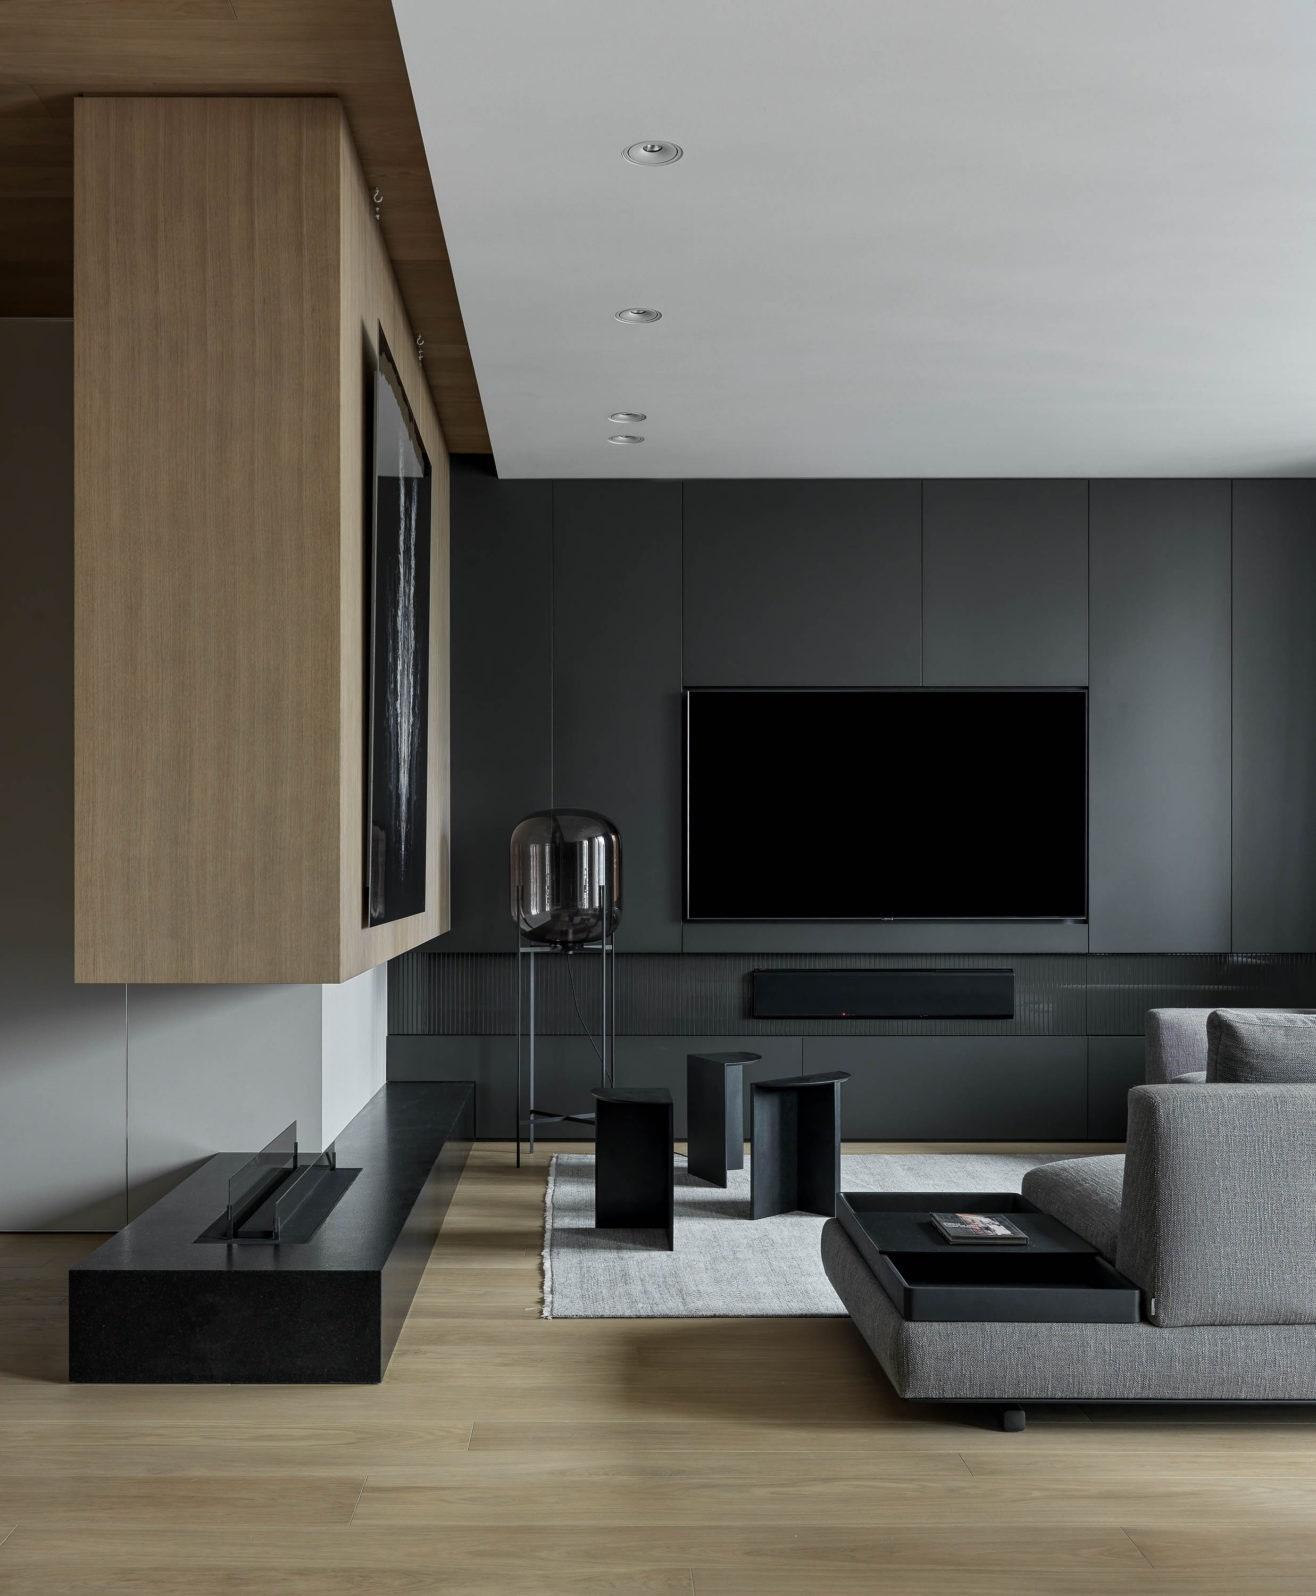 NIDO interiors 211 .      .            .    .        Balance amp Freedom.